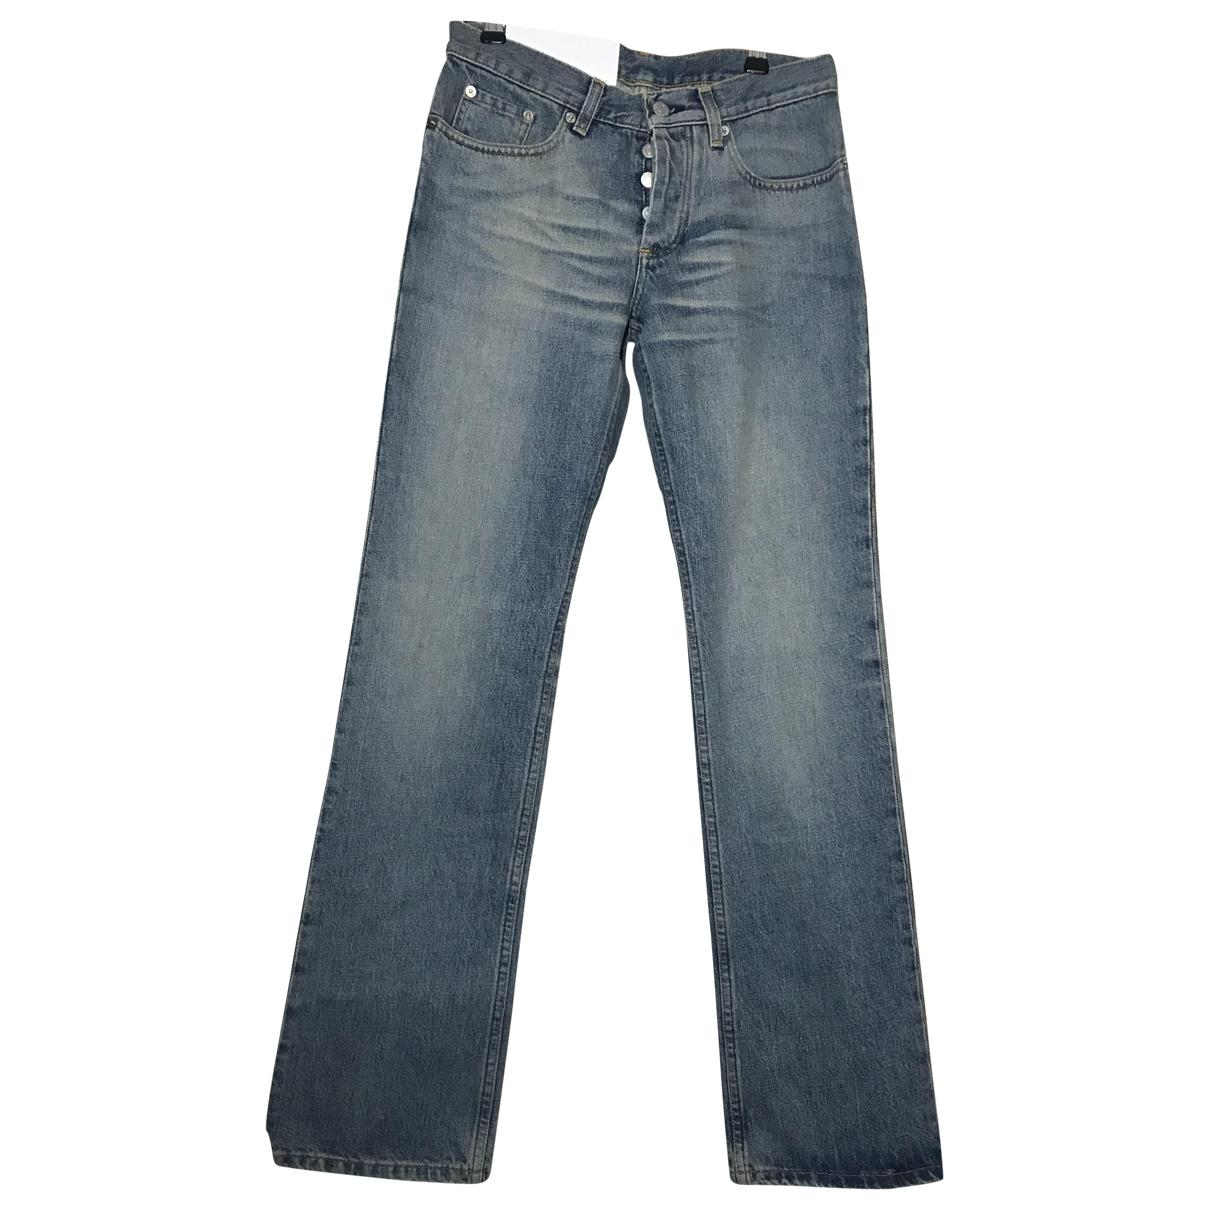 Helmut Lang \N Blue Denim - Jeans Jeans for Women 27 US